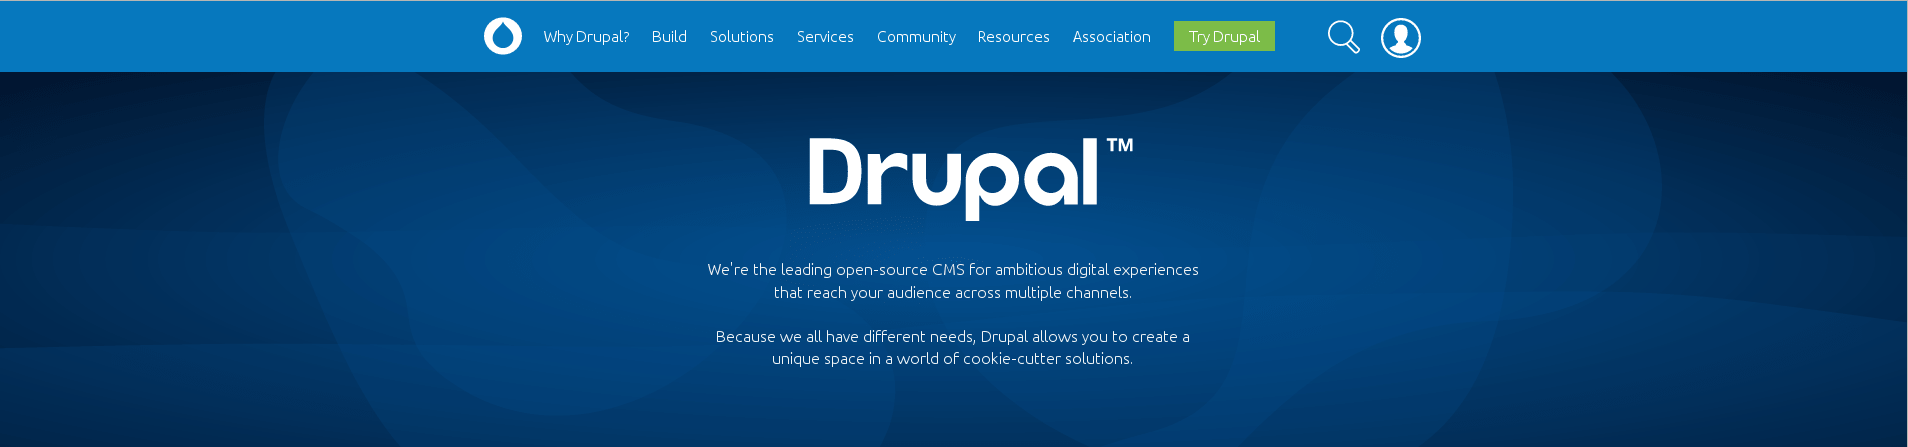 Aperçu du site du logiciel Drupal